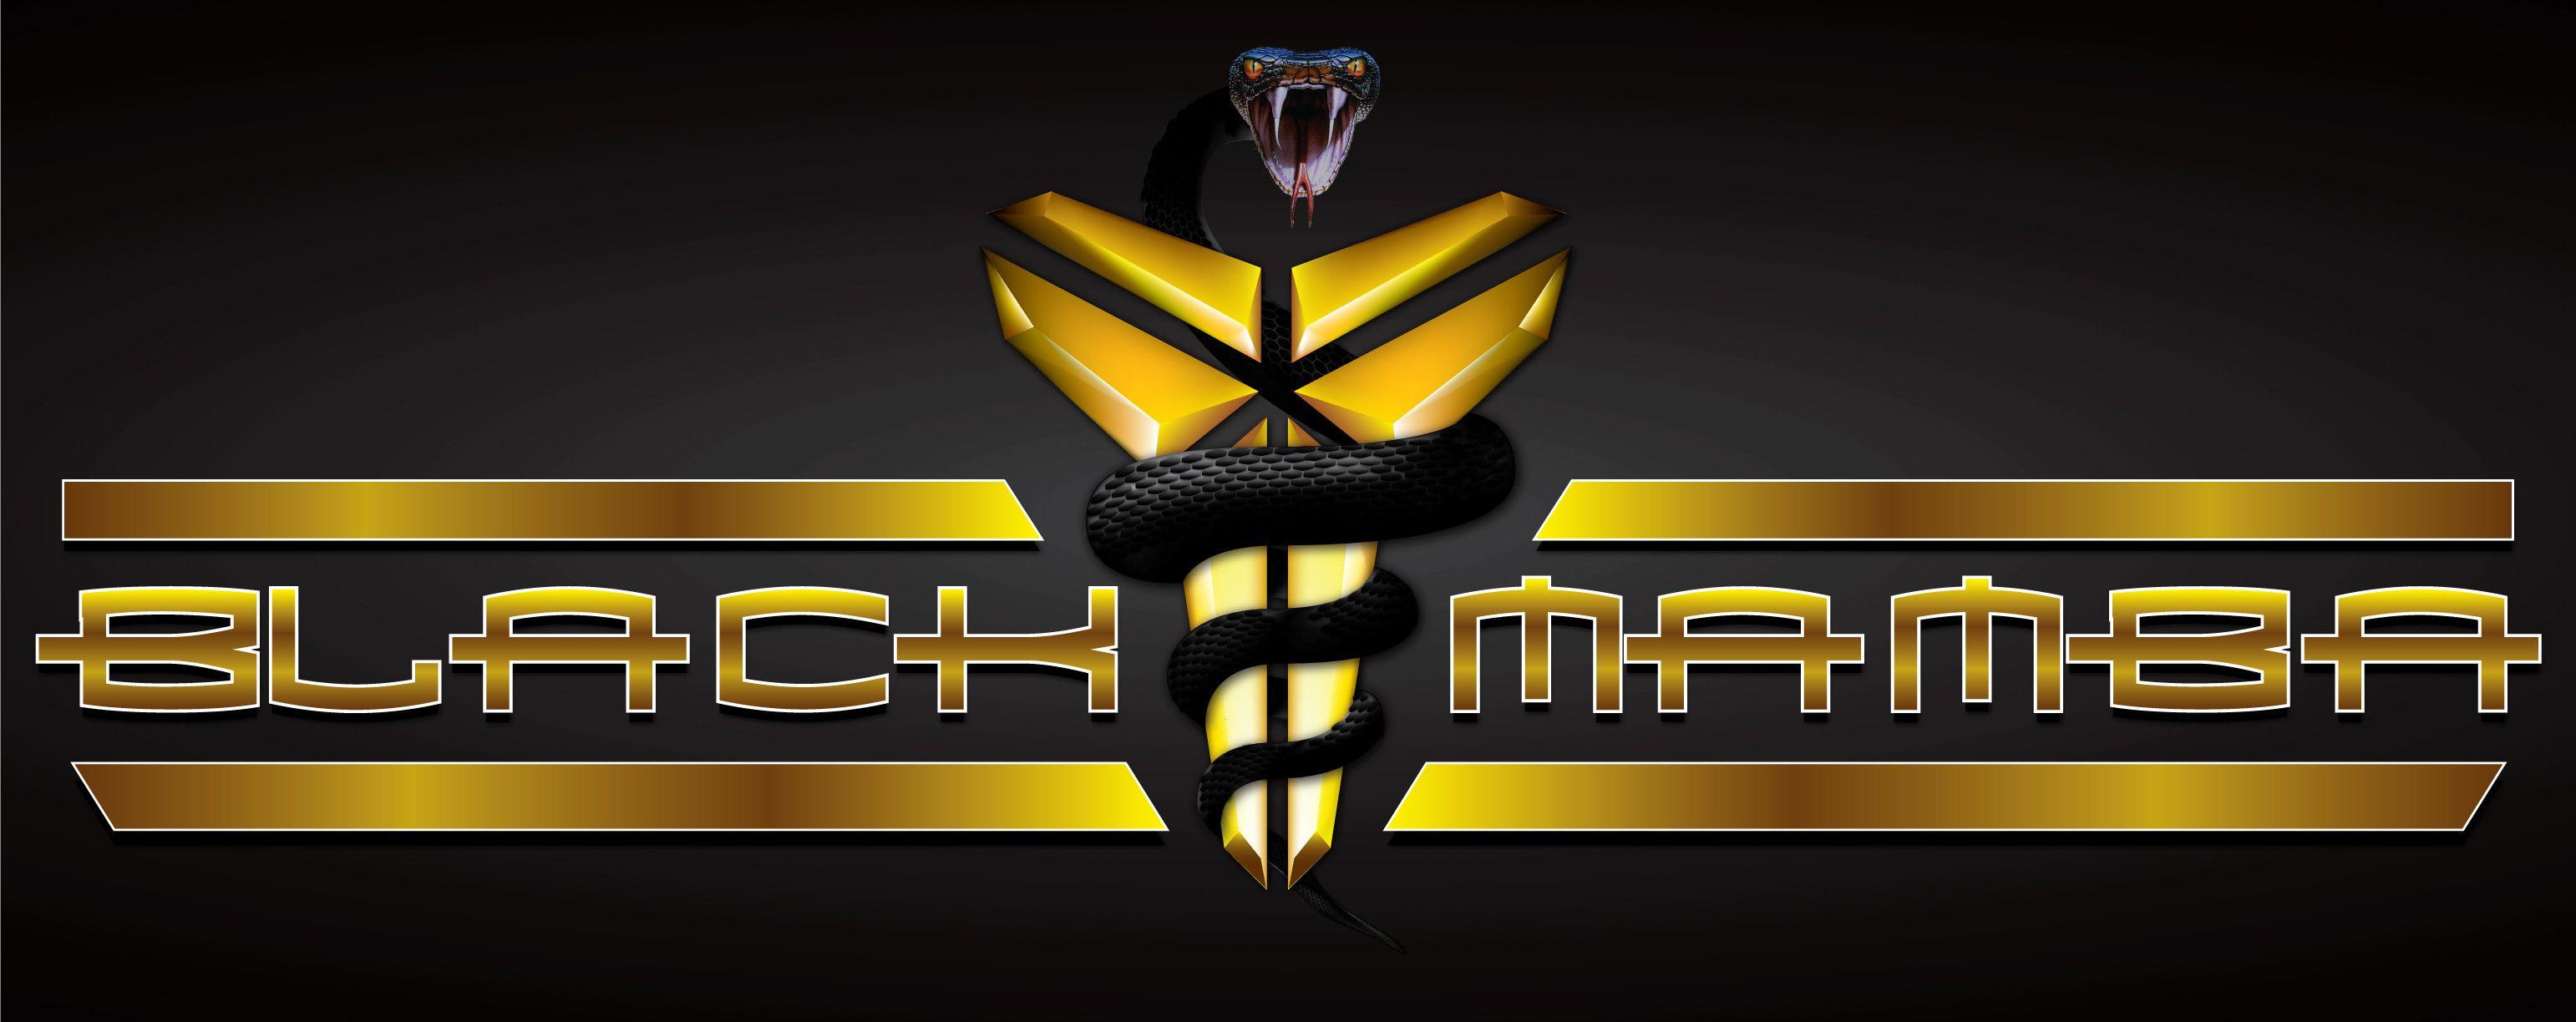 Mamba Logos Black Mamba Logo Design Logo Design Black Mamba Black Wallpaper Iphone